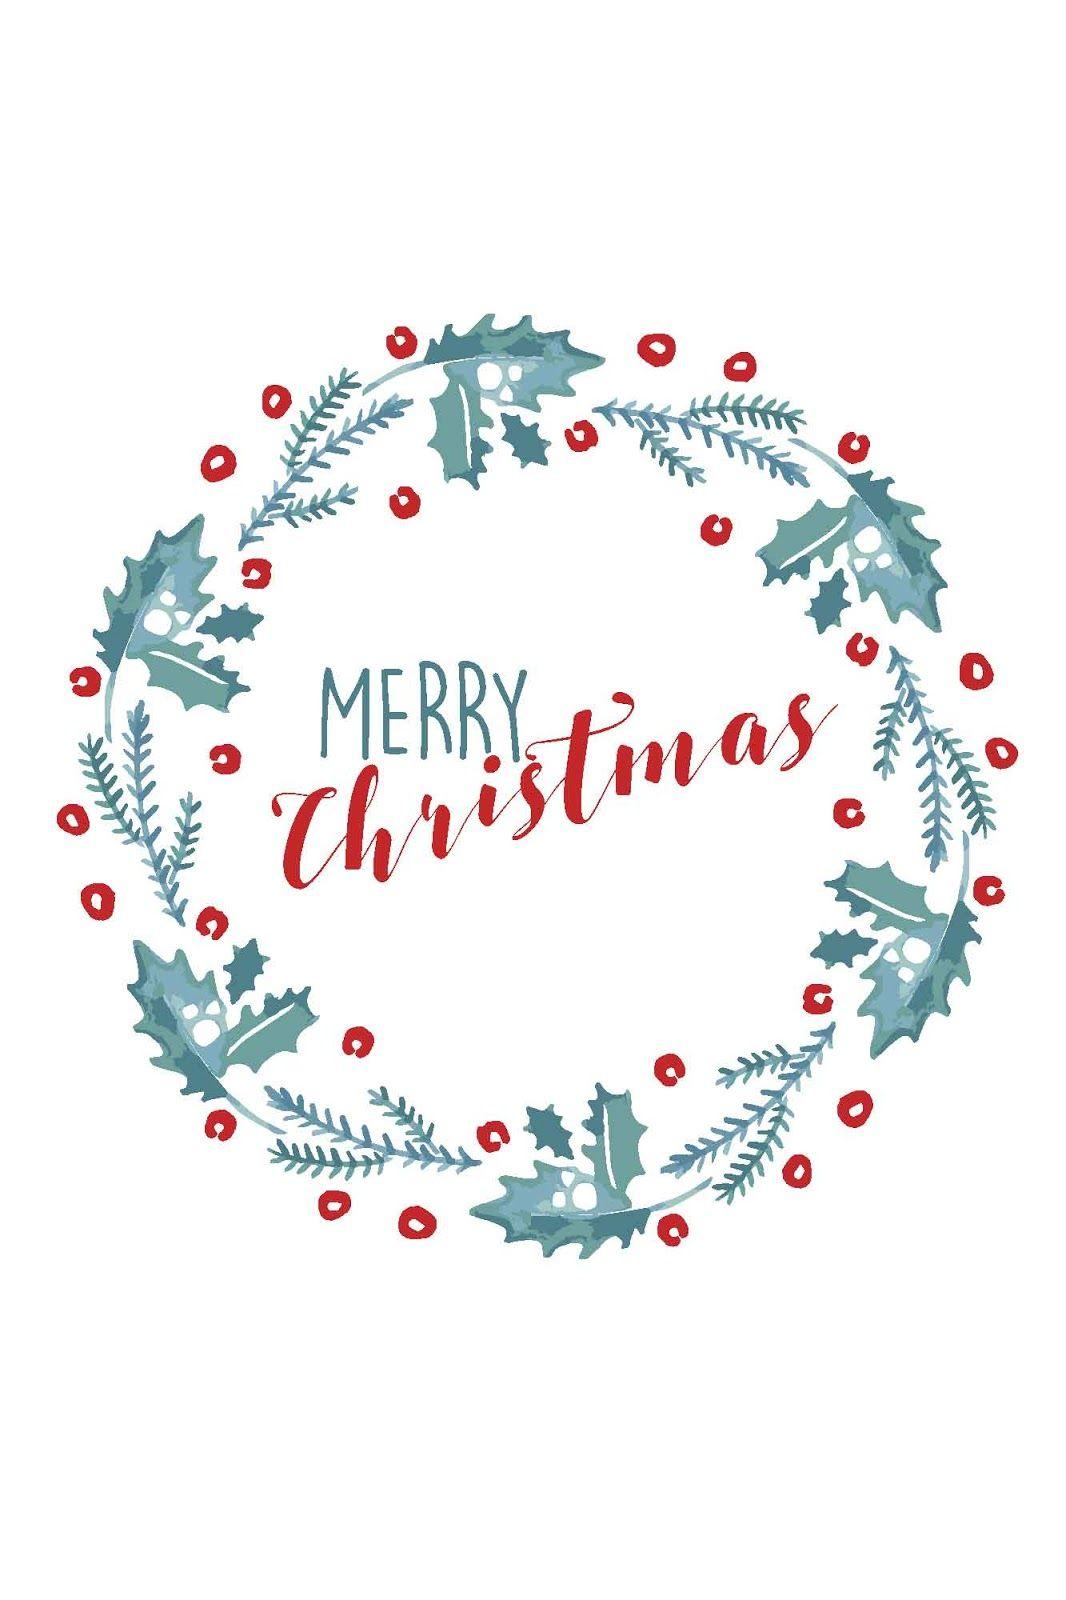 Free Christmas Card, Holiday Greeting Cards & Invitation Templates.